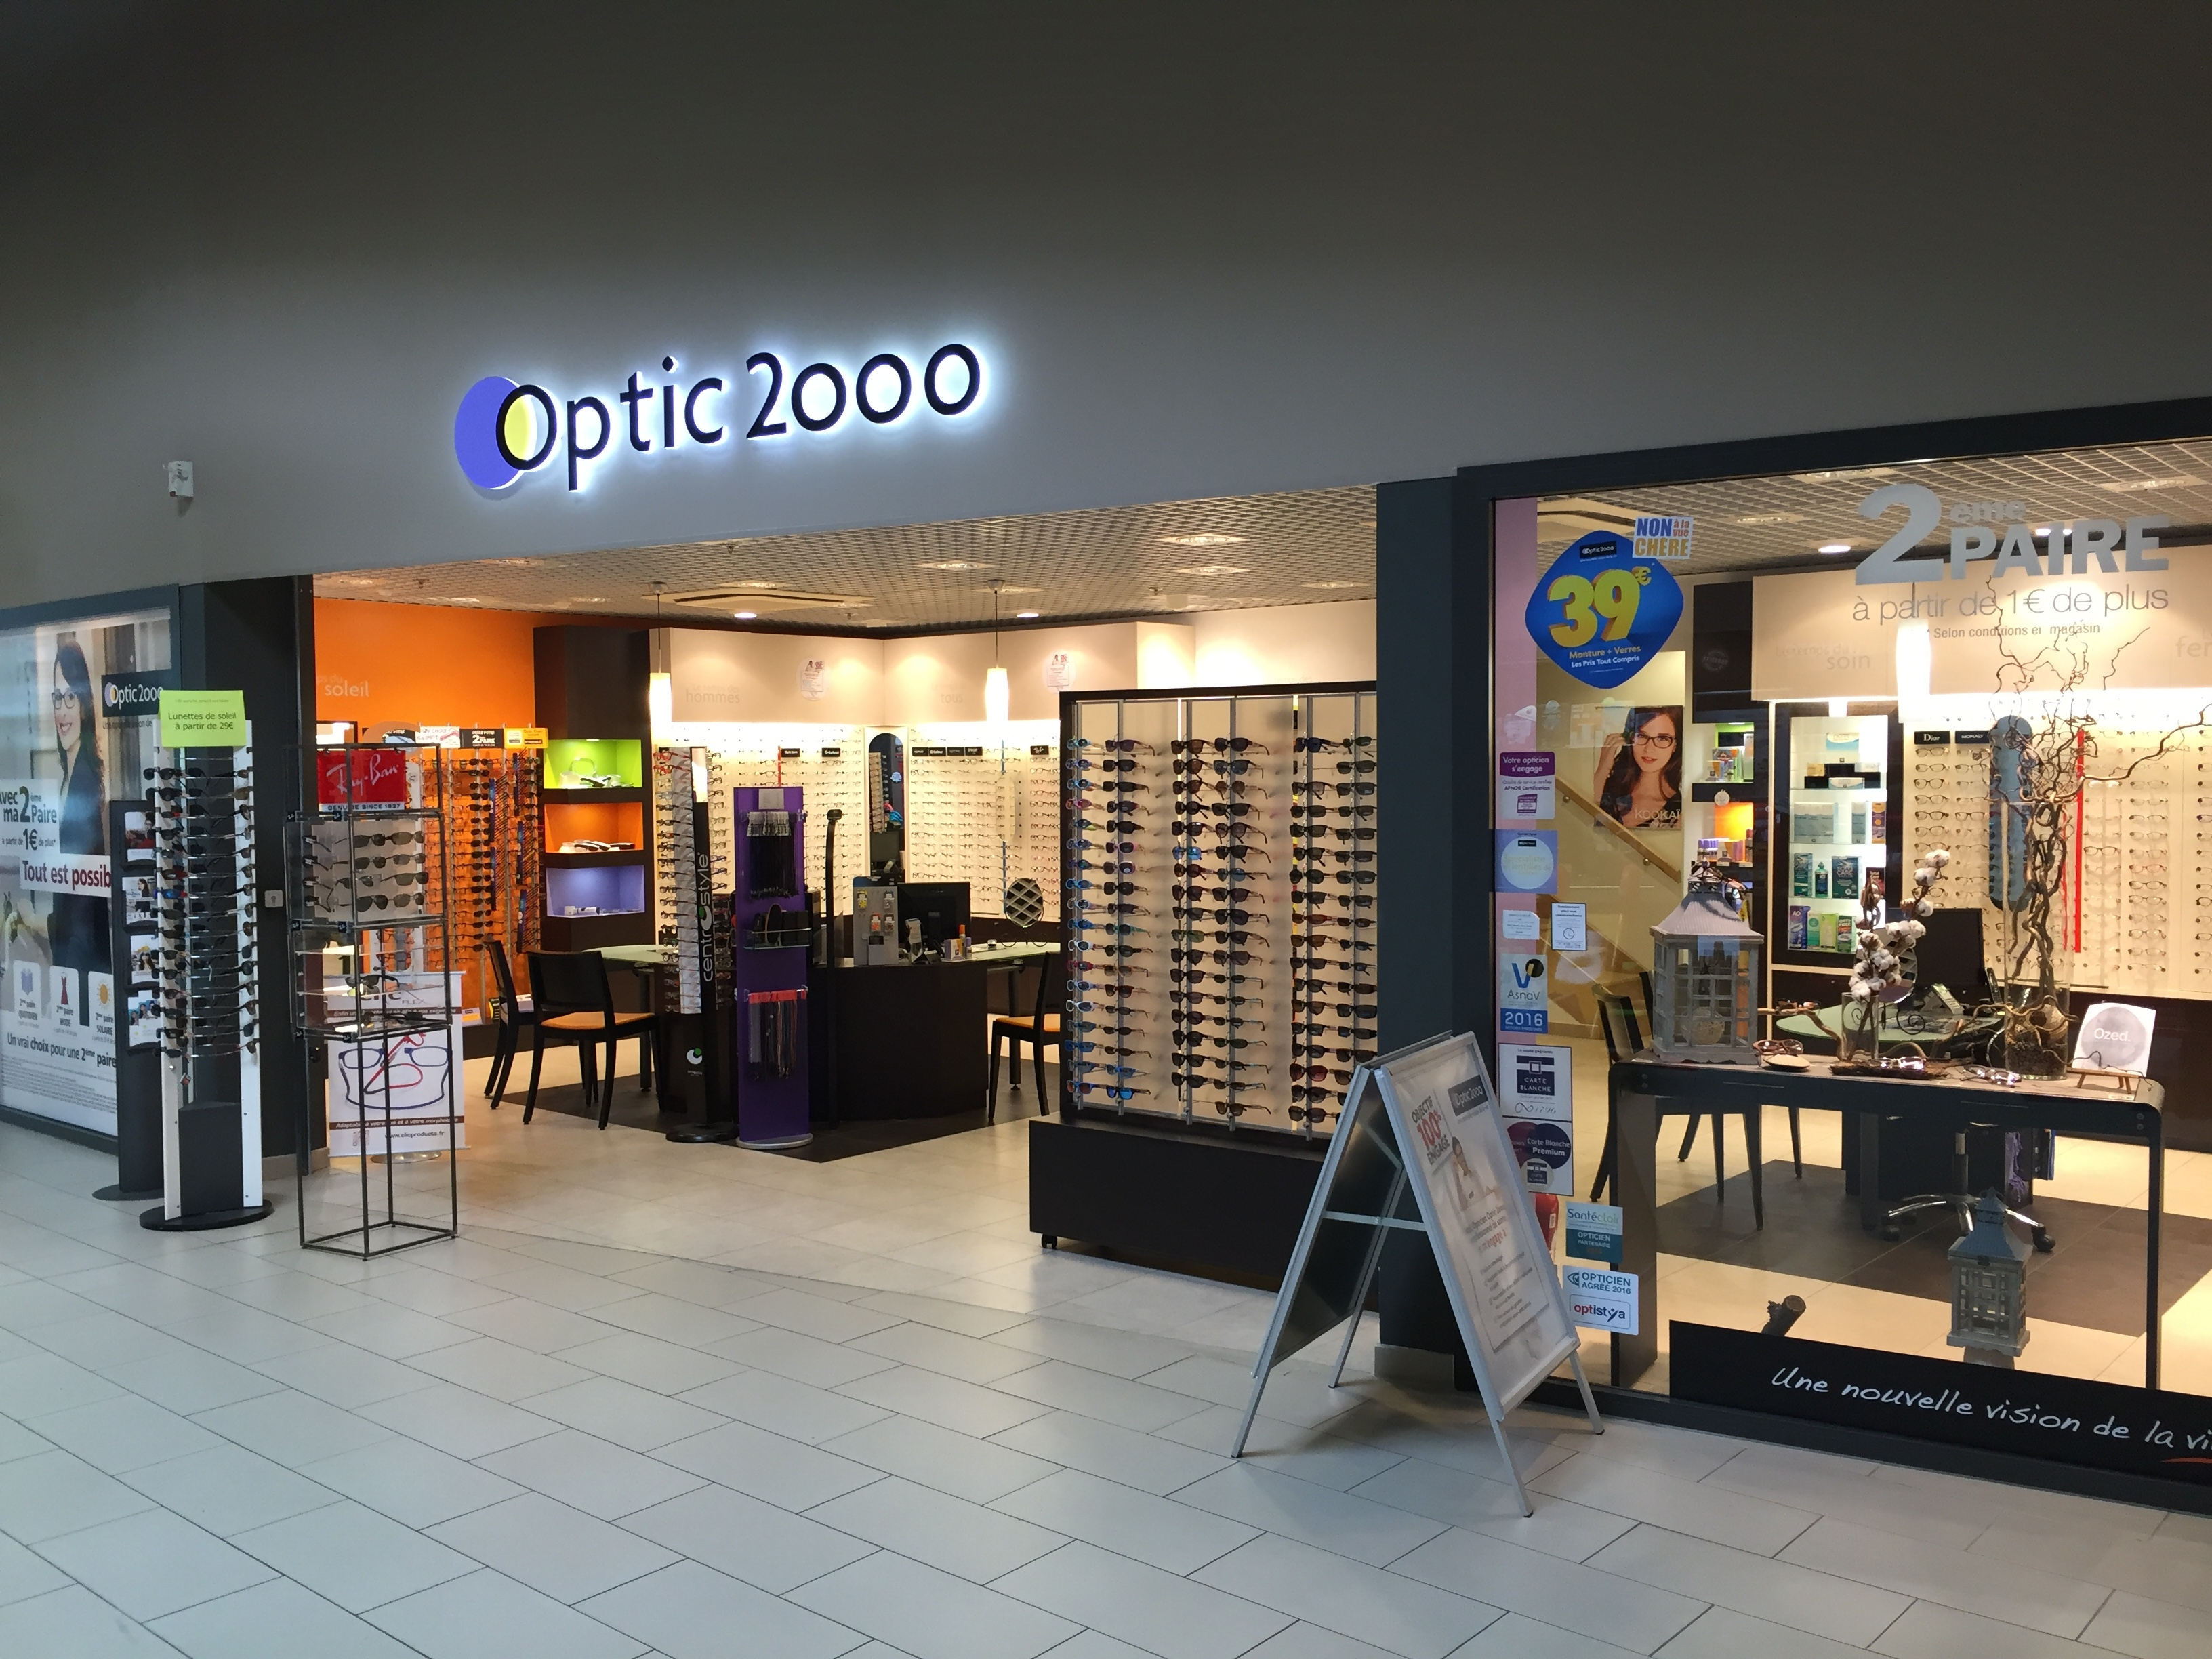 opticien loudeac 22600 lunettes femme lunettes homme optic 2000. Black Bedroom Furniture Sets. Home Design Ideas